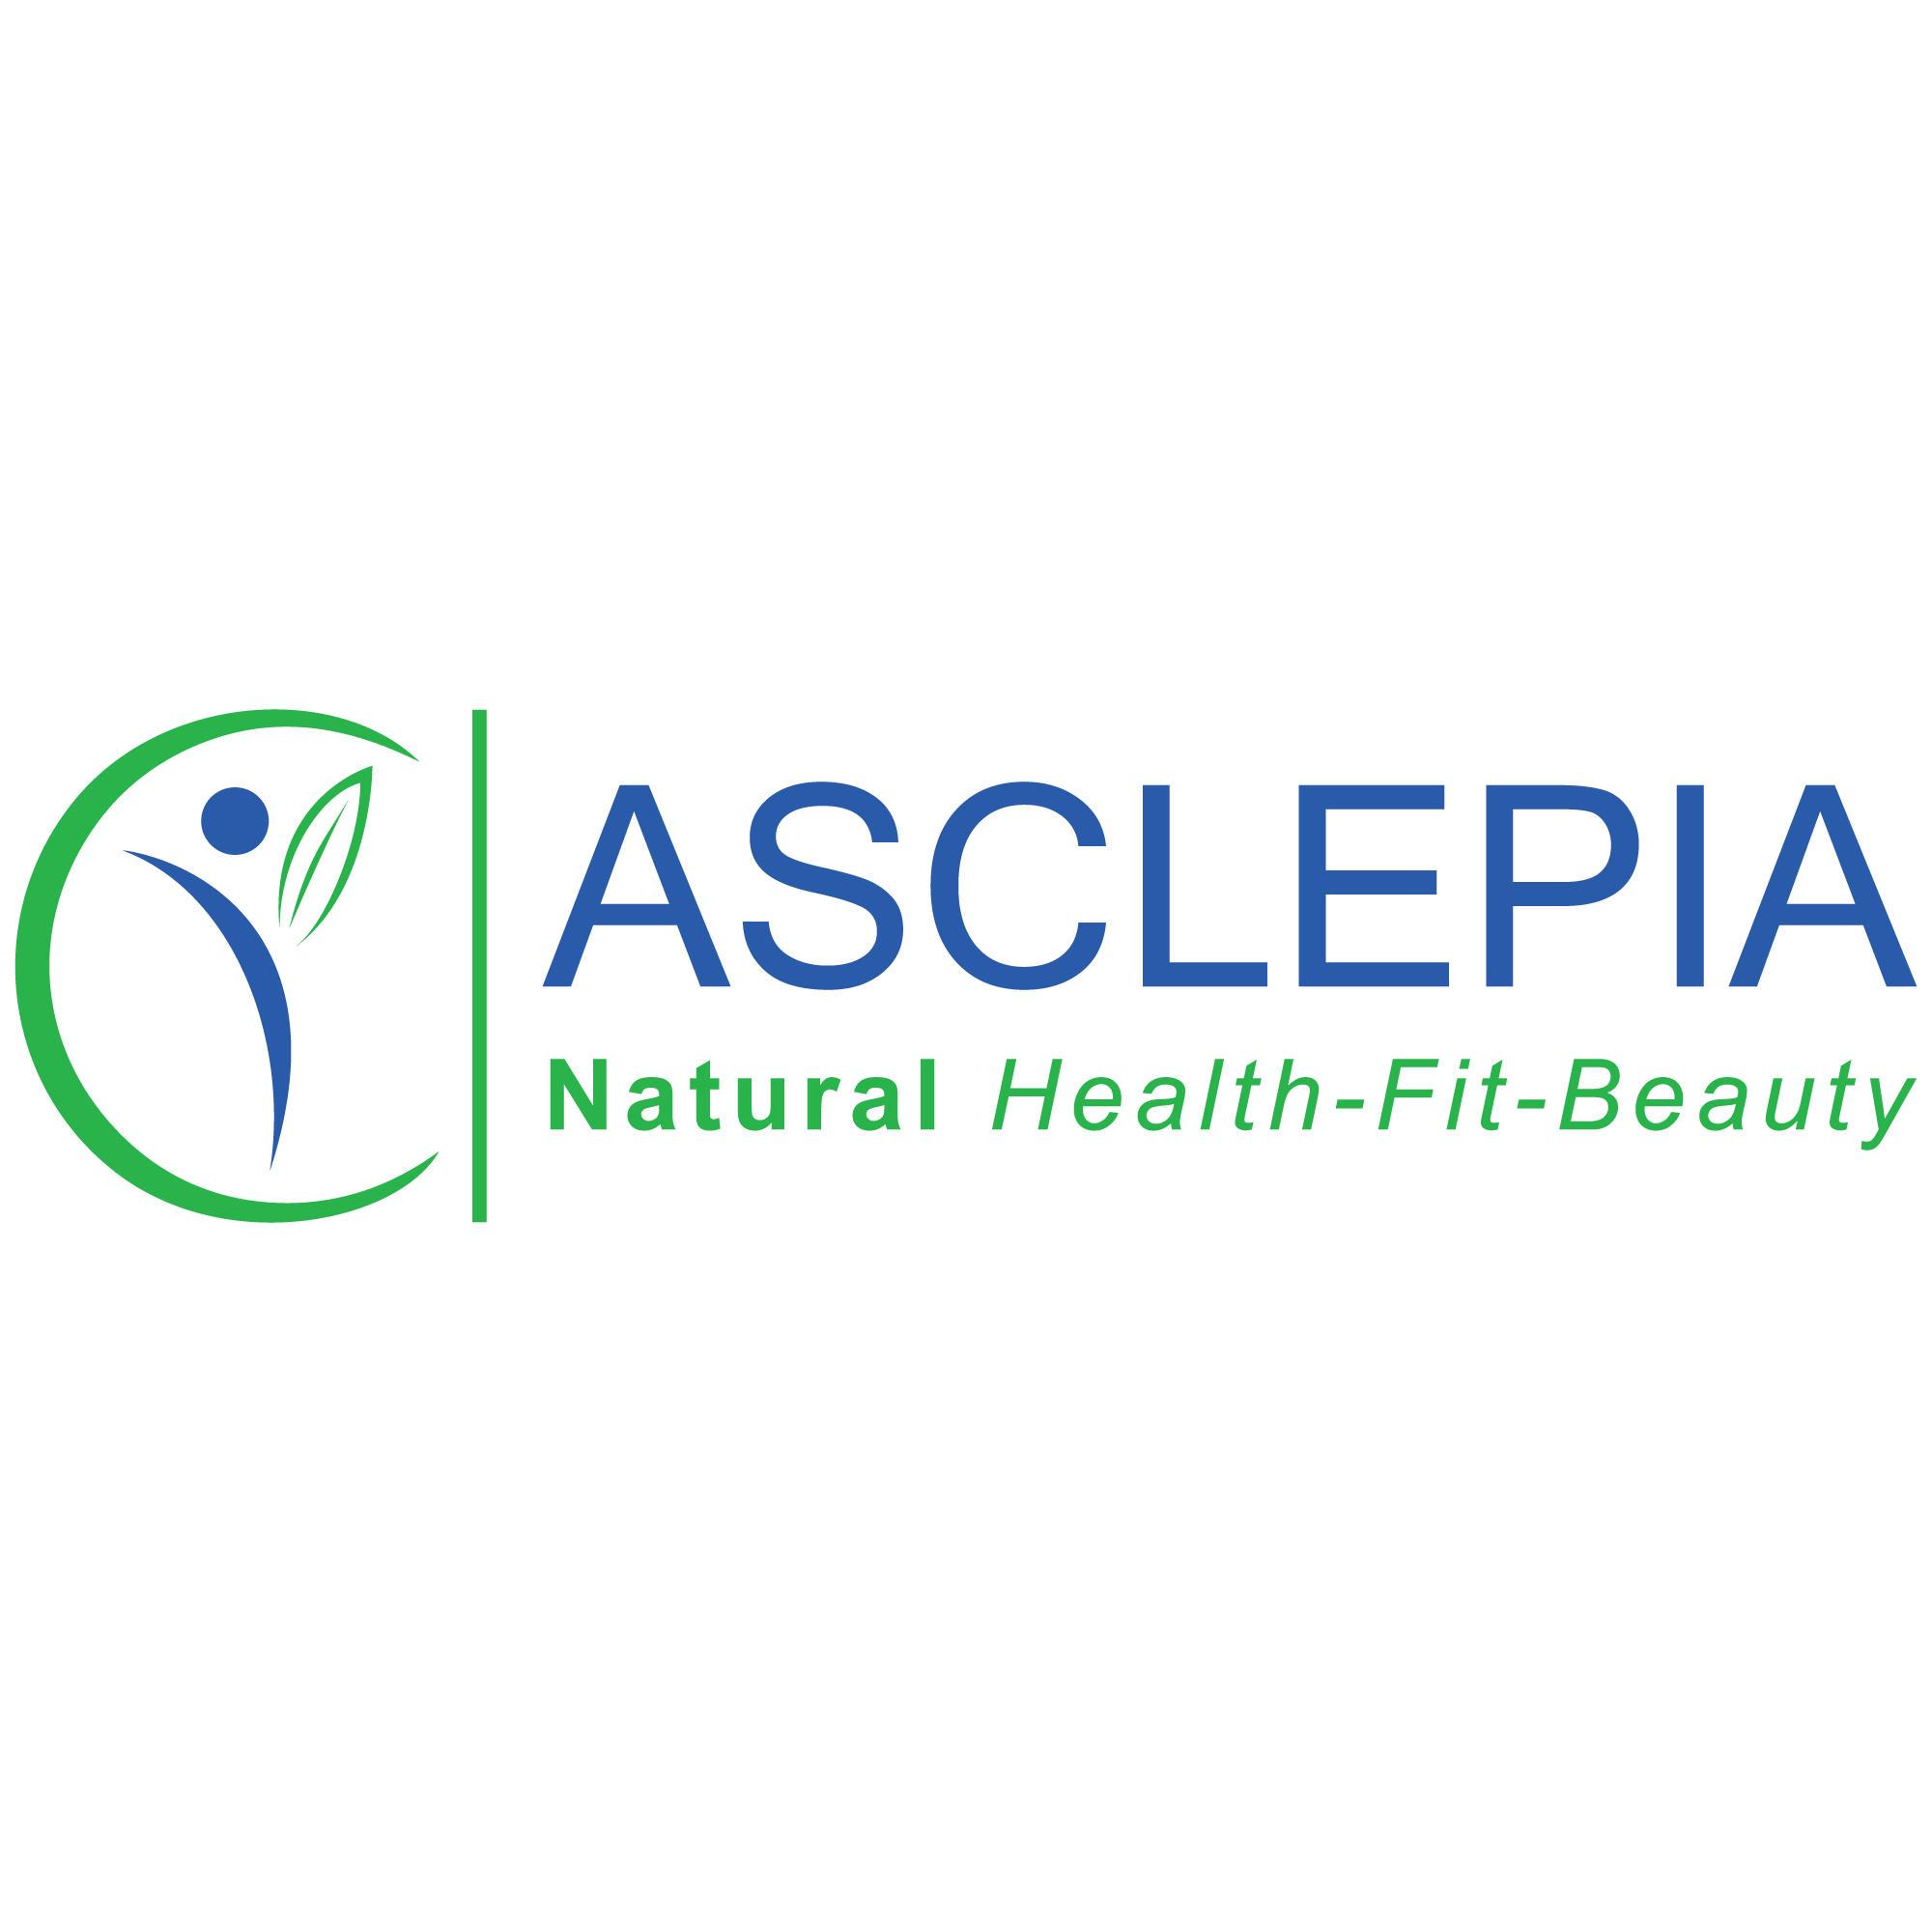 Asclepia